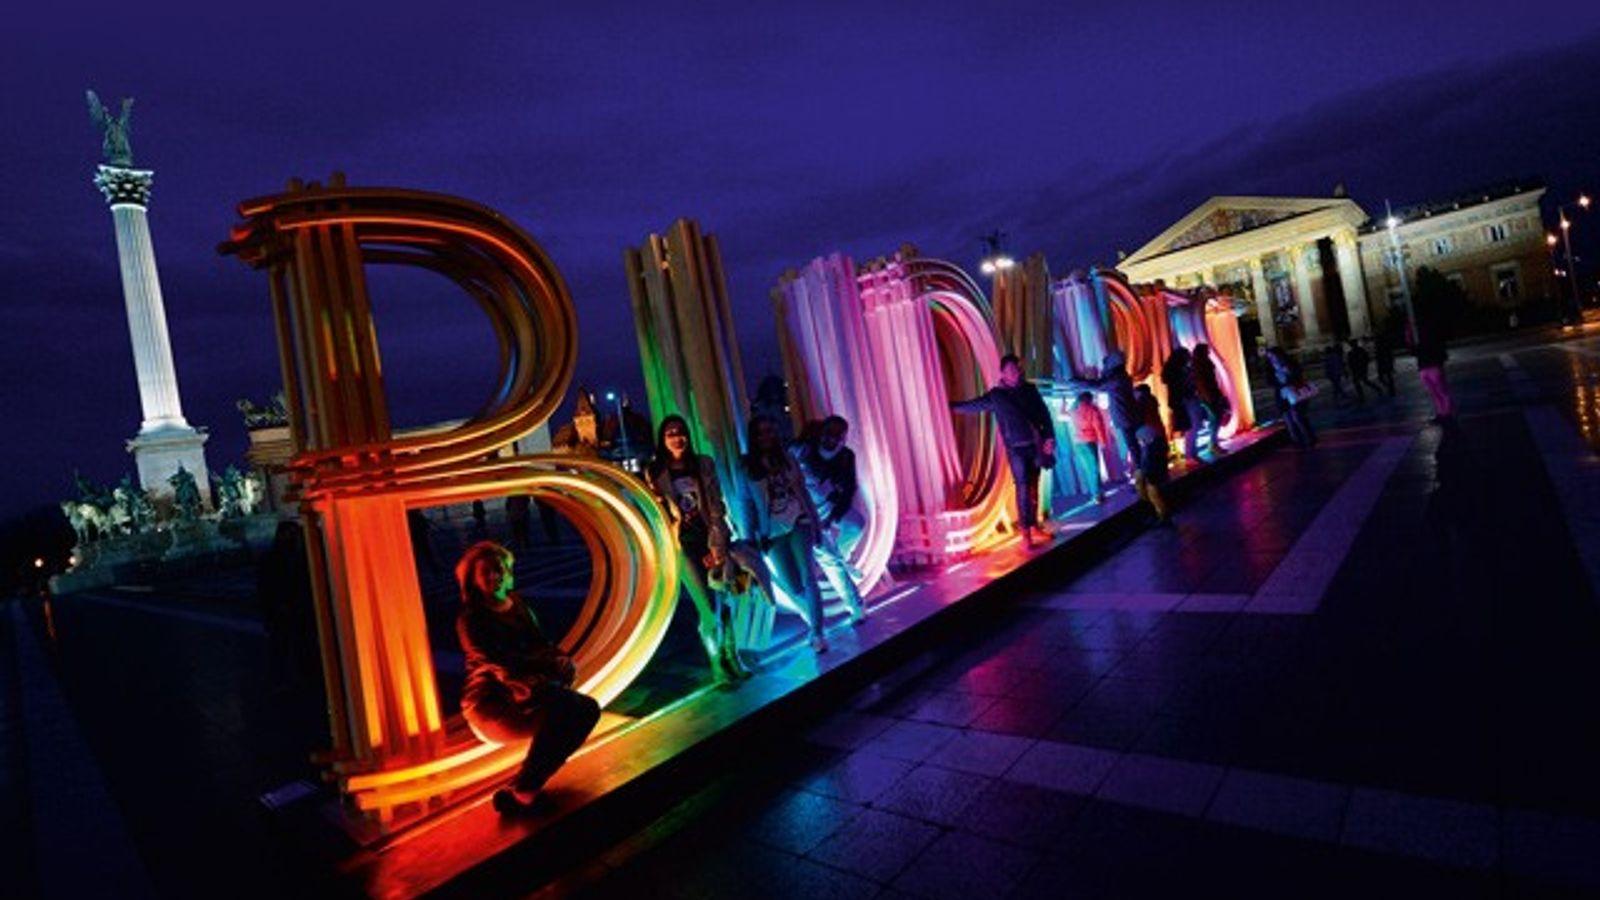 Giant illuminated 'Budapest' sign at Heroes Square, Budapest.